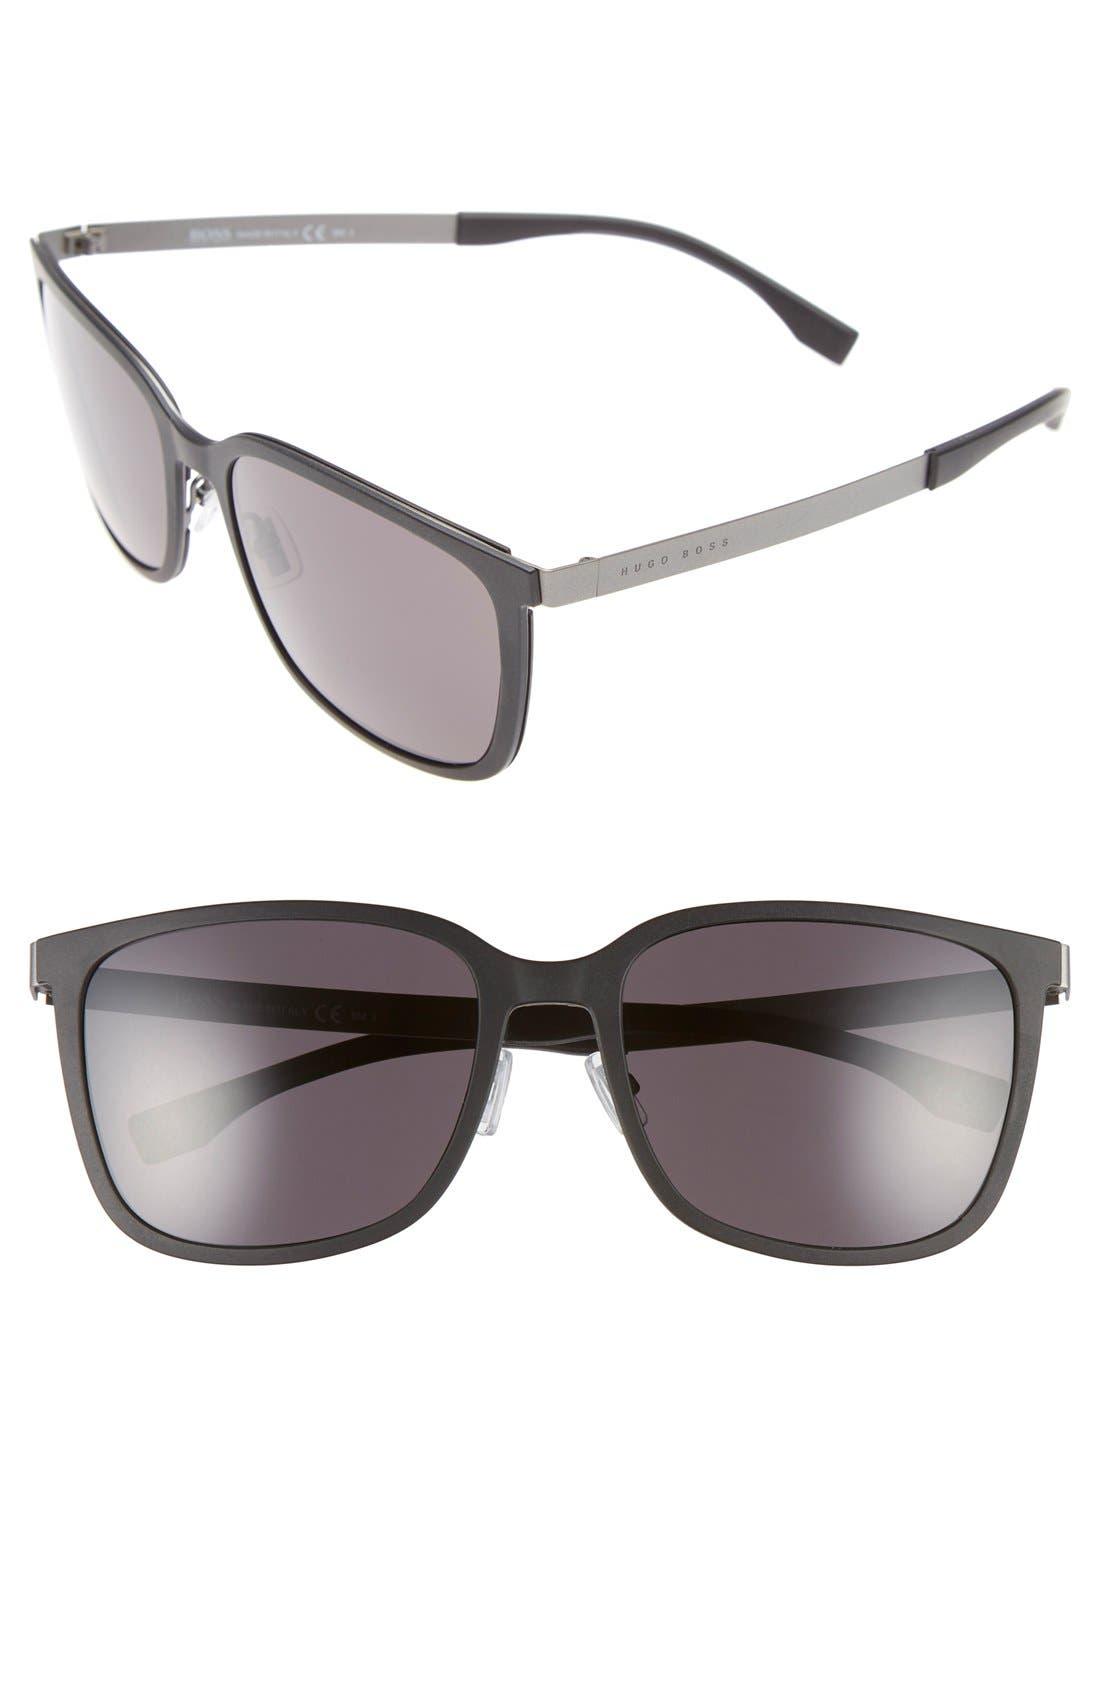 BOSS 56mm Retro Sunglasses, Main, color, 001